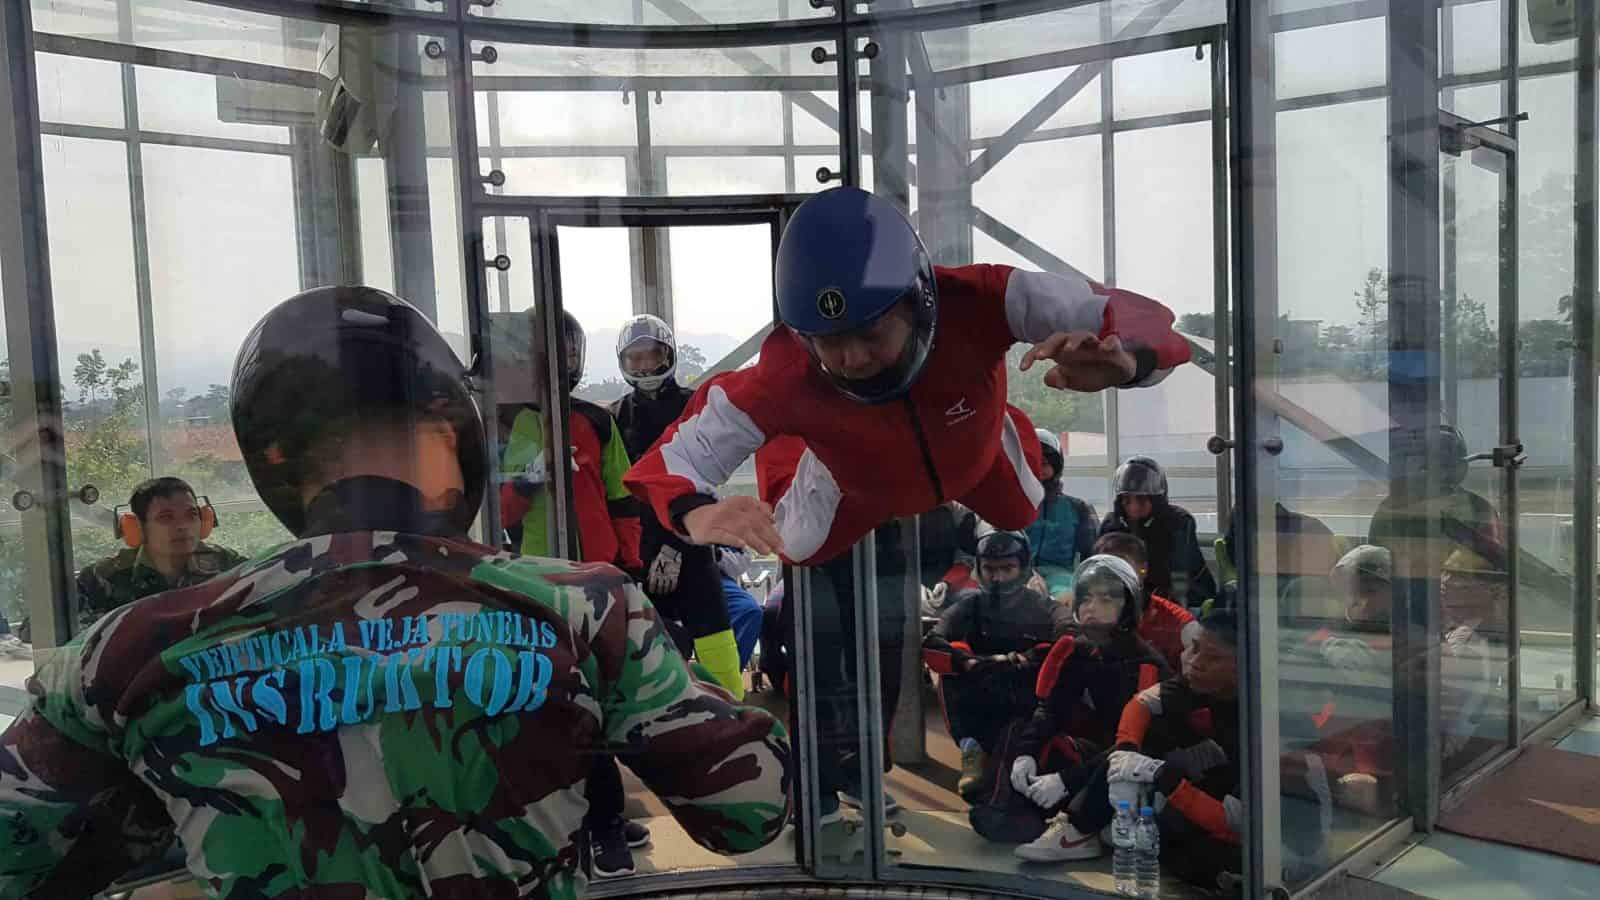 Pelatihan Formation Skydive Vertical Wind Tunnel di Pusdiklat Paskhas Berakhir